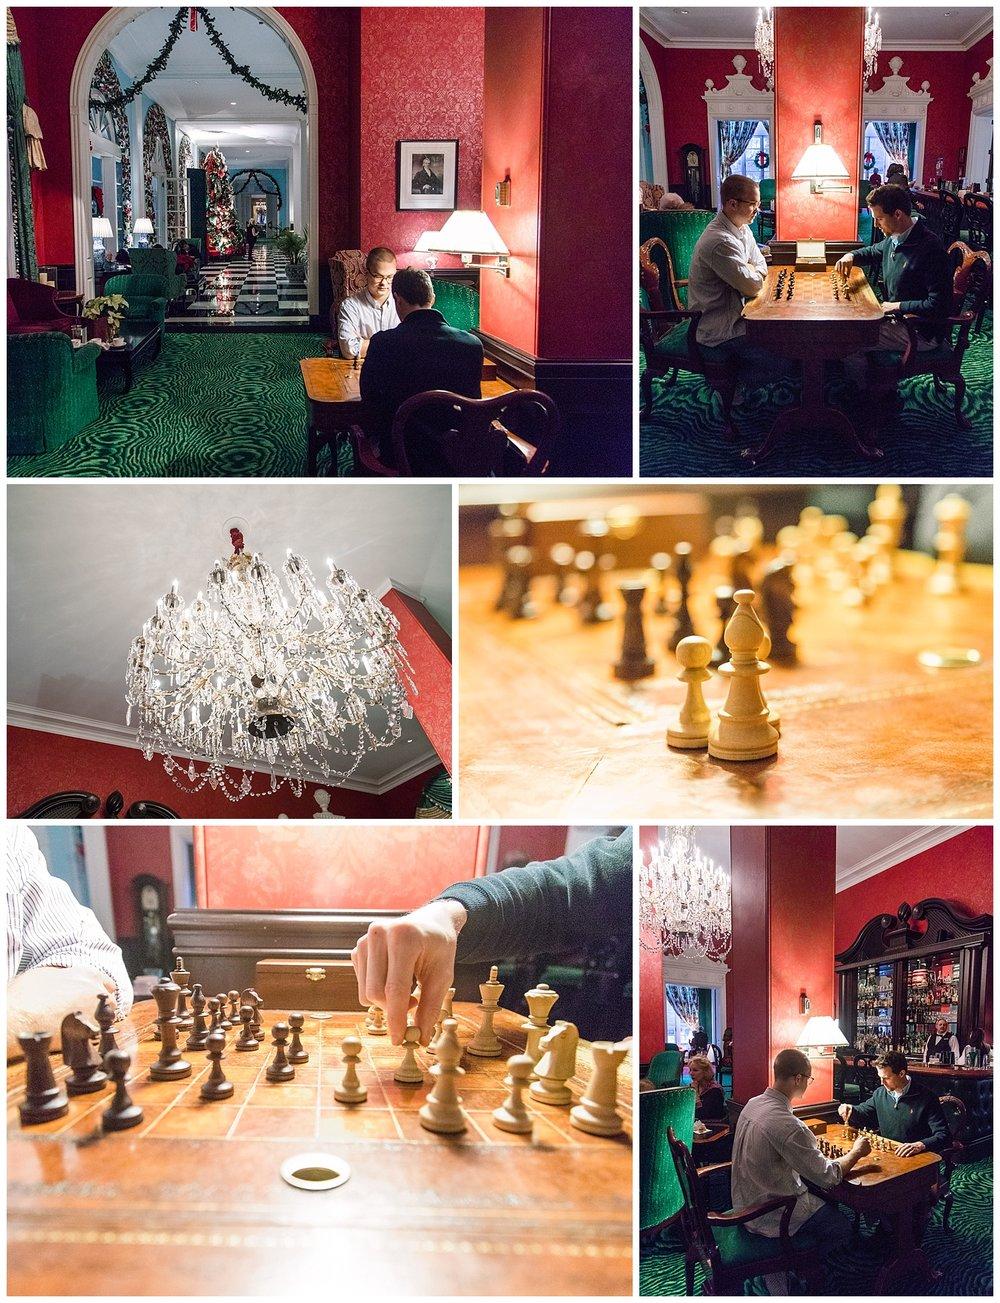 Greenbrier Lobby Bar - chess